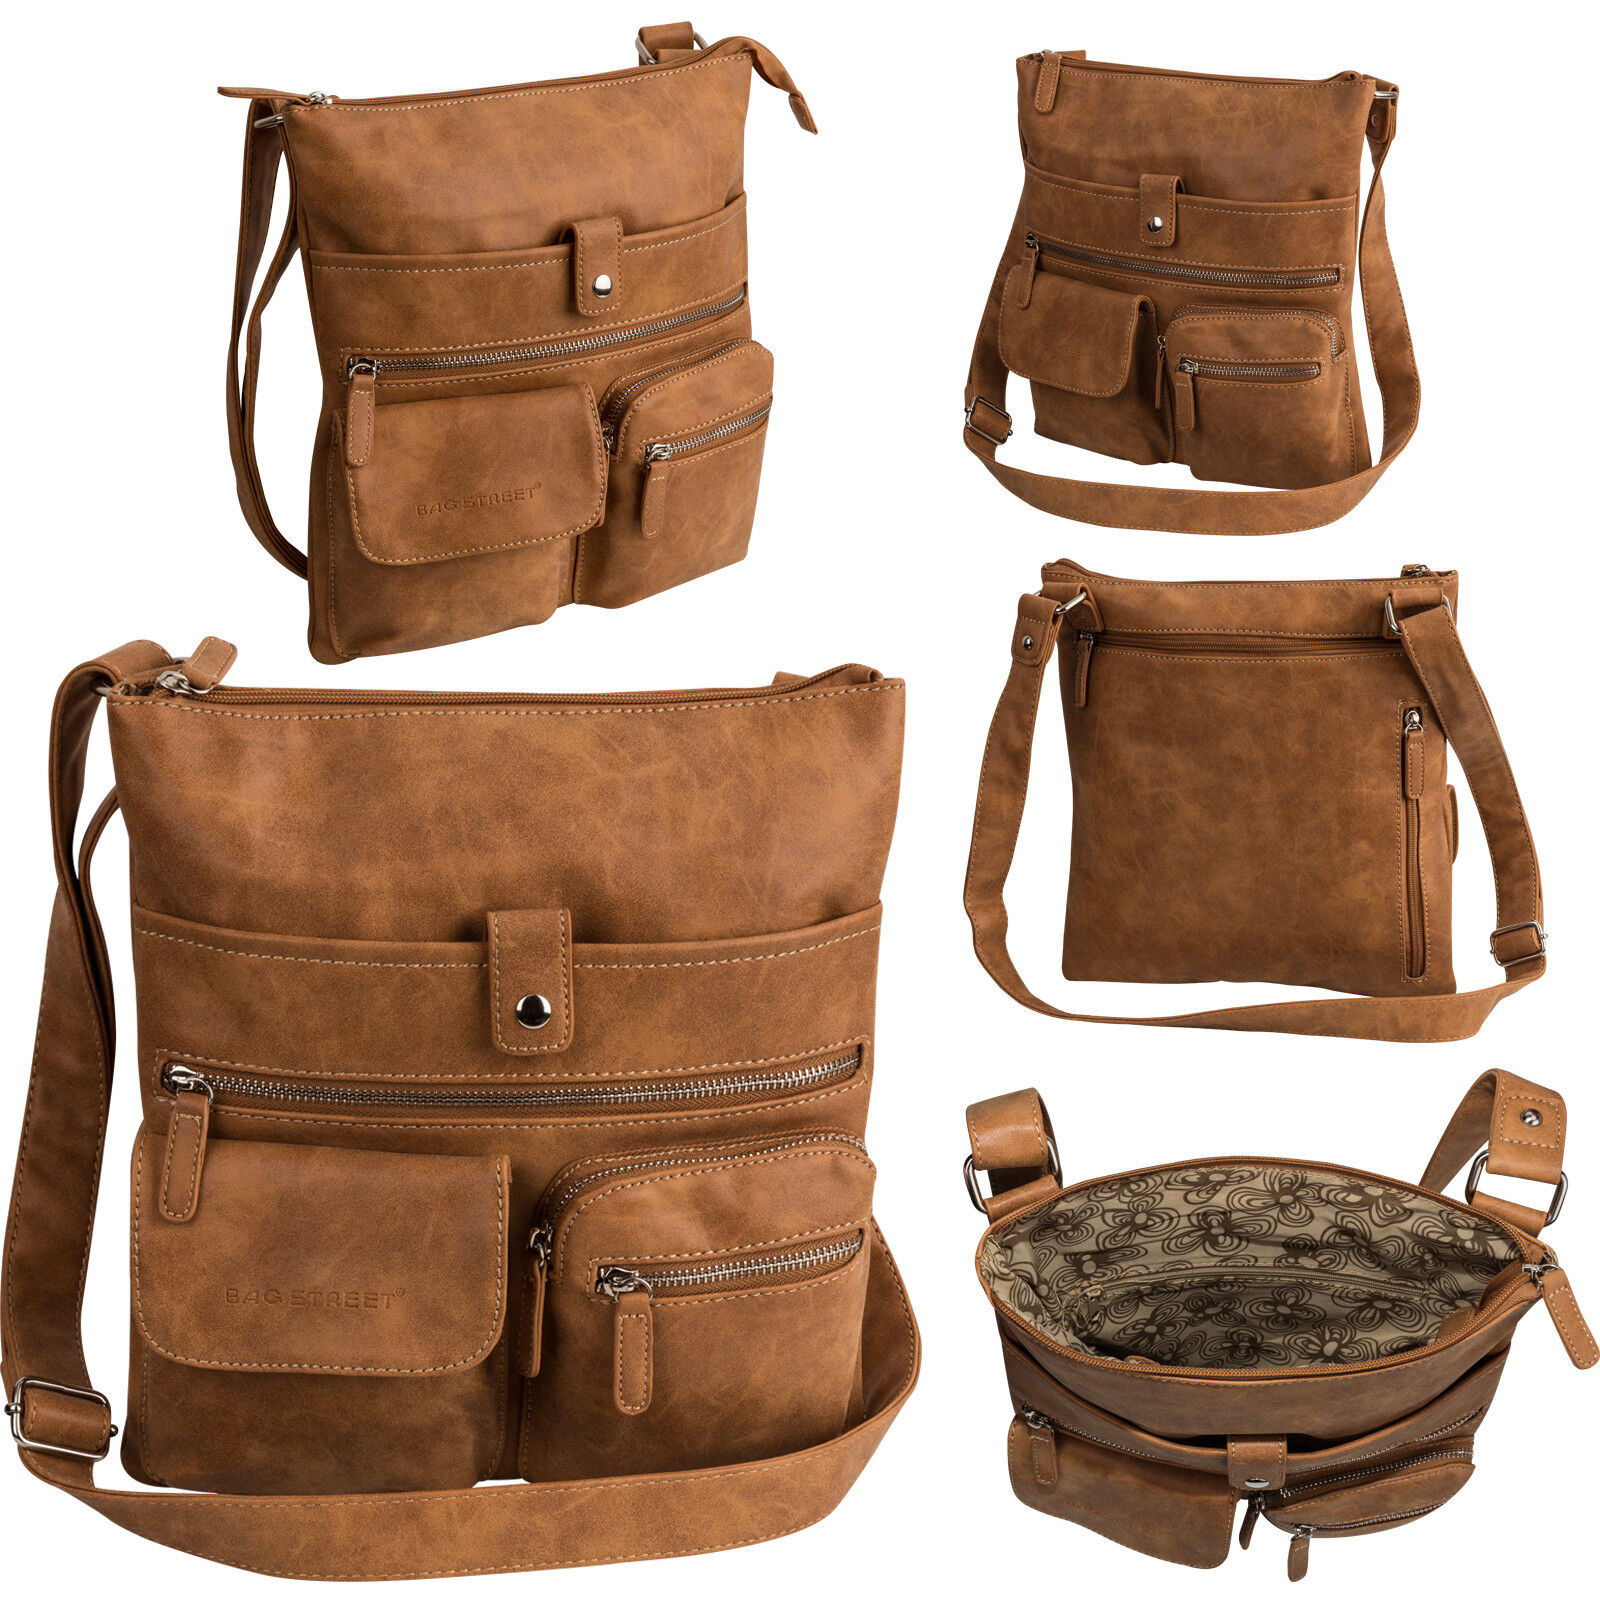 Bag Street Damentasche Umhängetasche Handtasche Schultertasche K2 T0100 Cognac